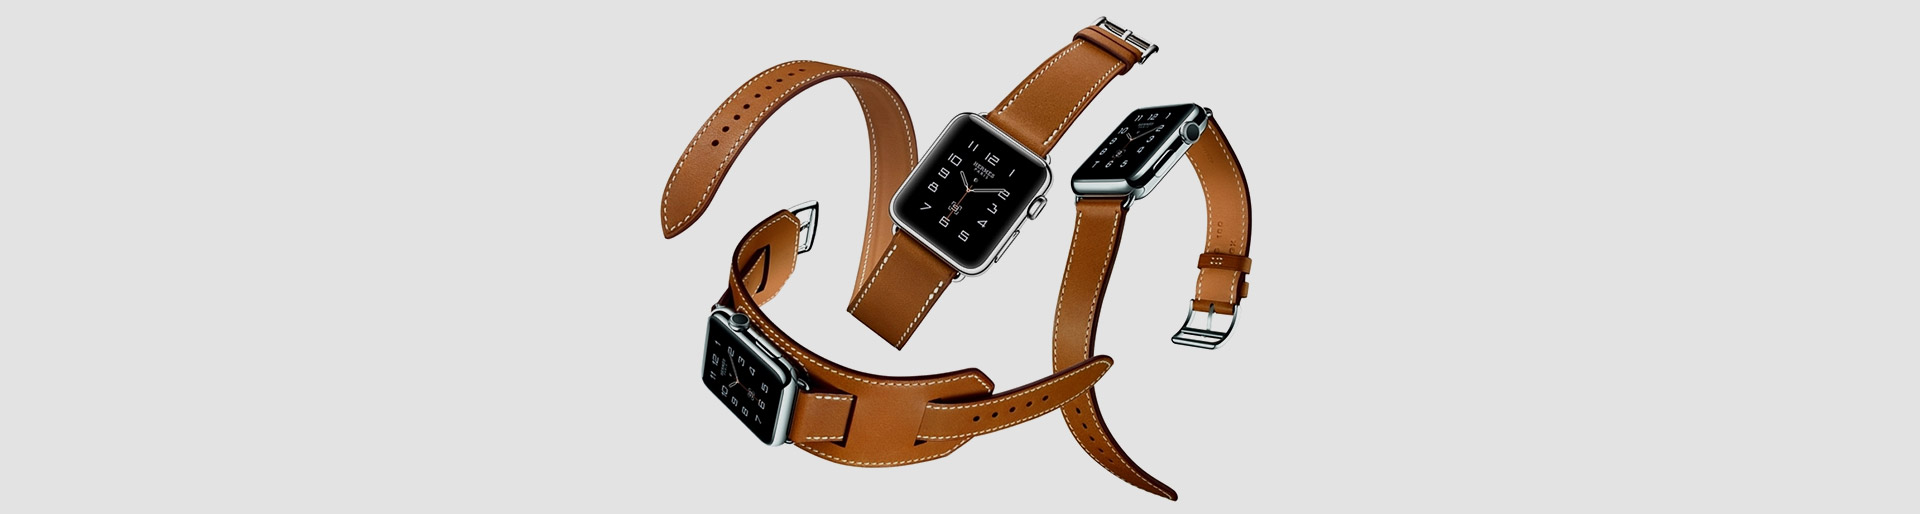 ibrostore_apple_watch_header